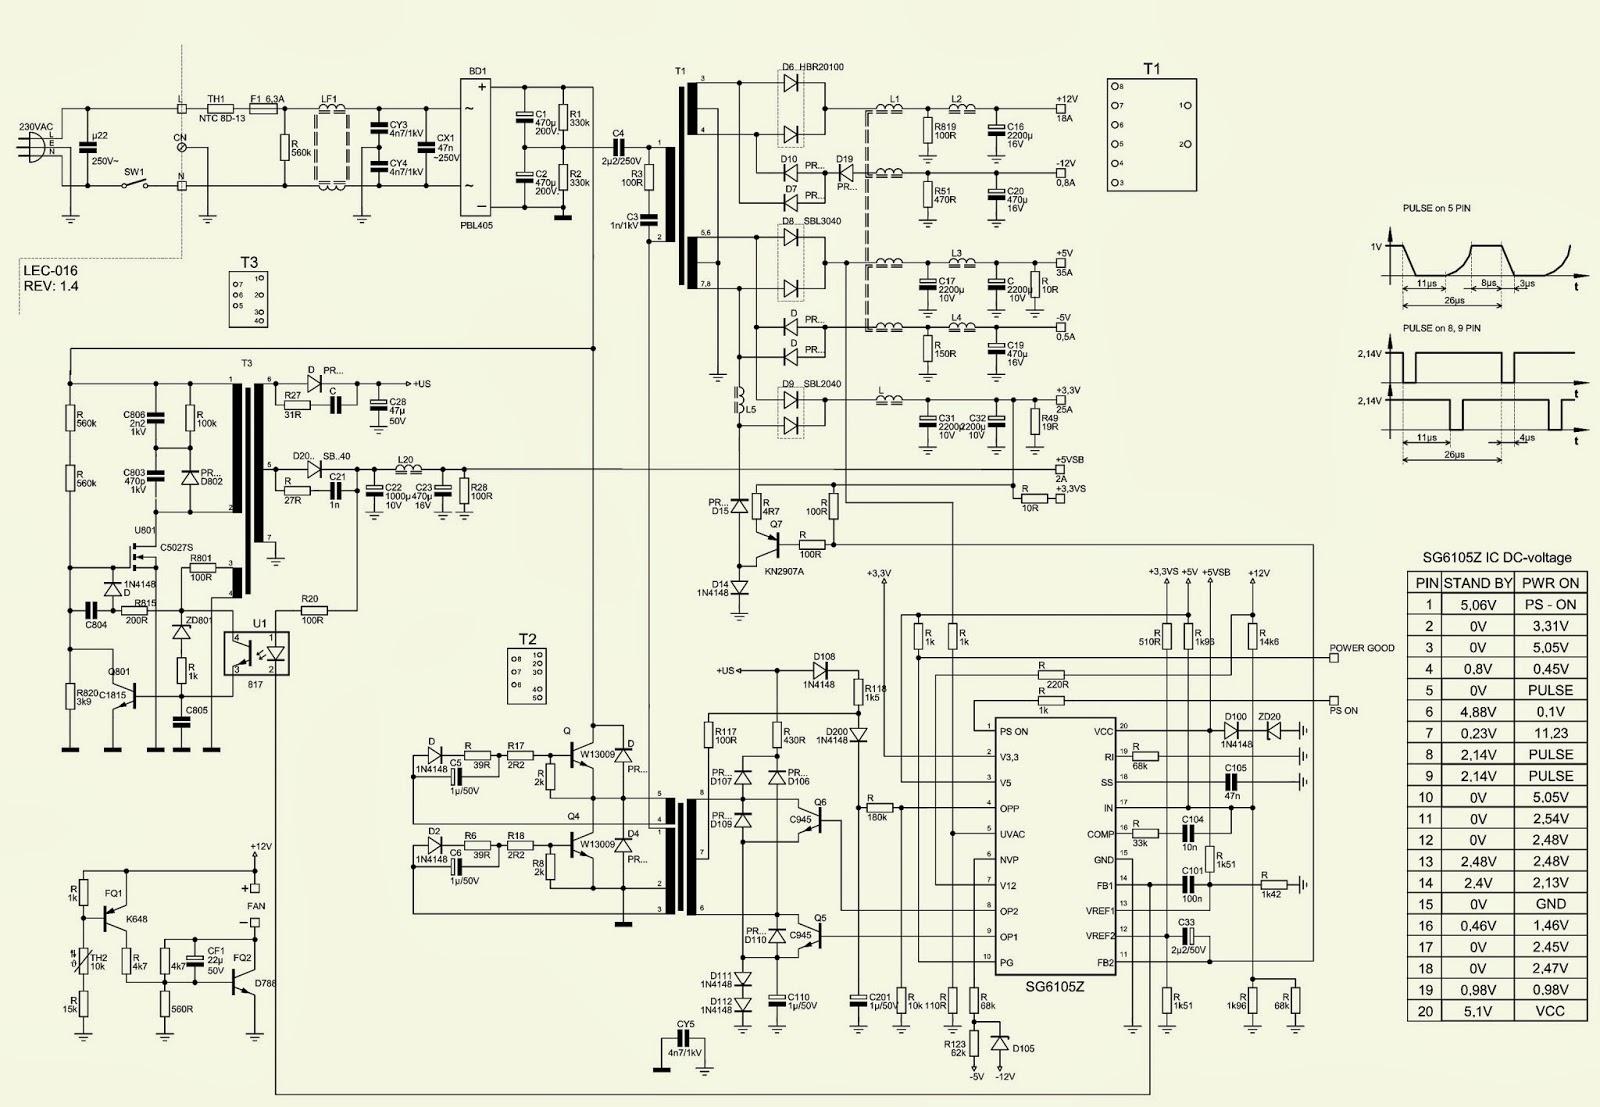 Fantastic Diagram Math Thick Stratocaster Electronics Rectangular Reznor F75 Ibanez Hss Guitar Youthful 3 Pickup Les Paul Wiring Diagram WhiteReznor Unit Heater Wiring Diagram Pc Power Supply Pinouts   Dolgular